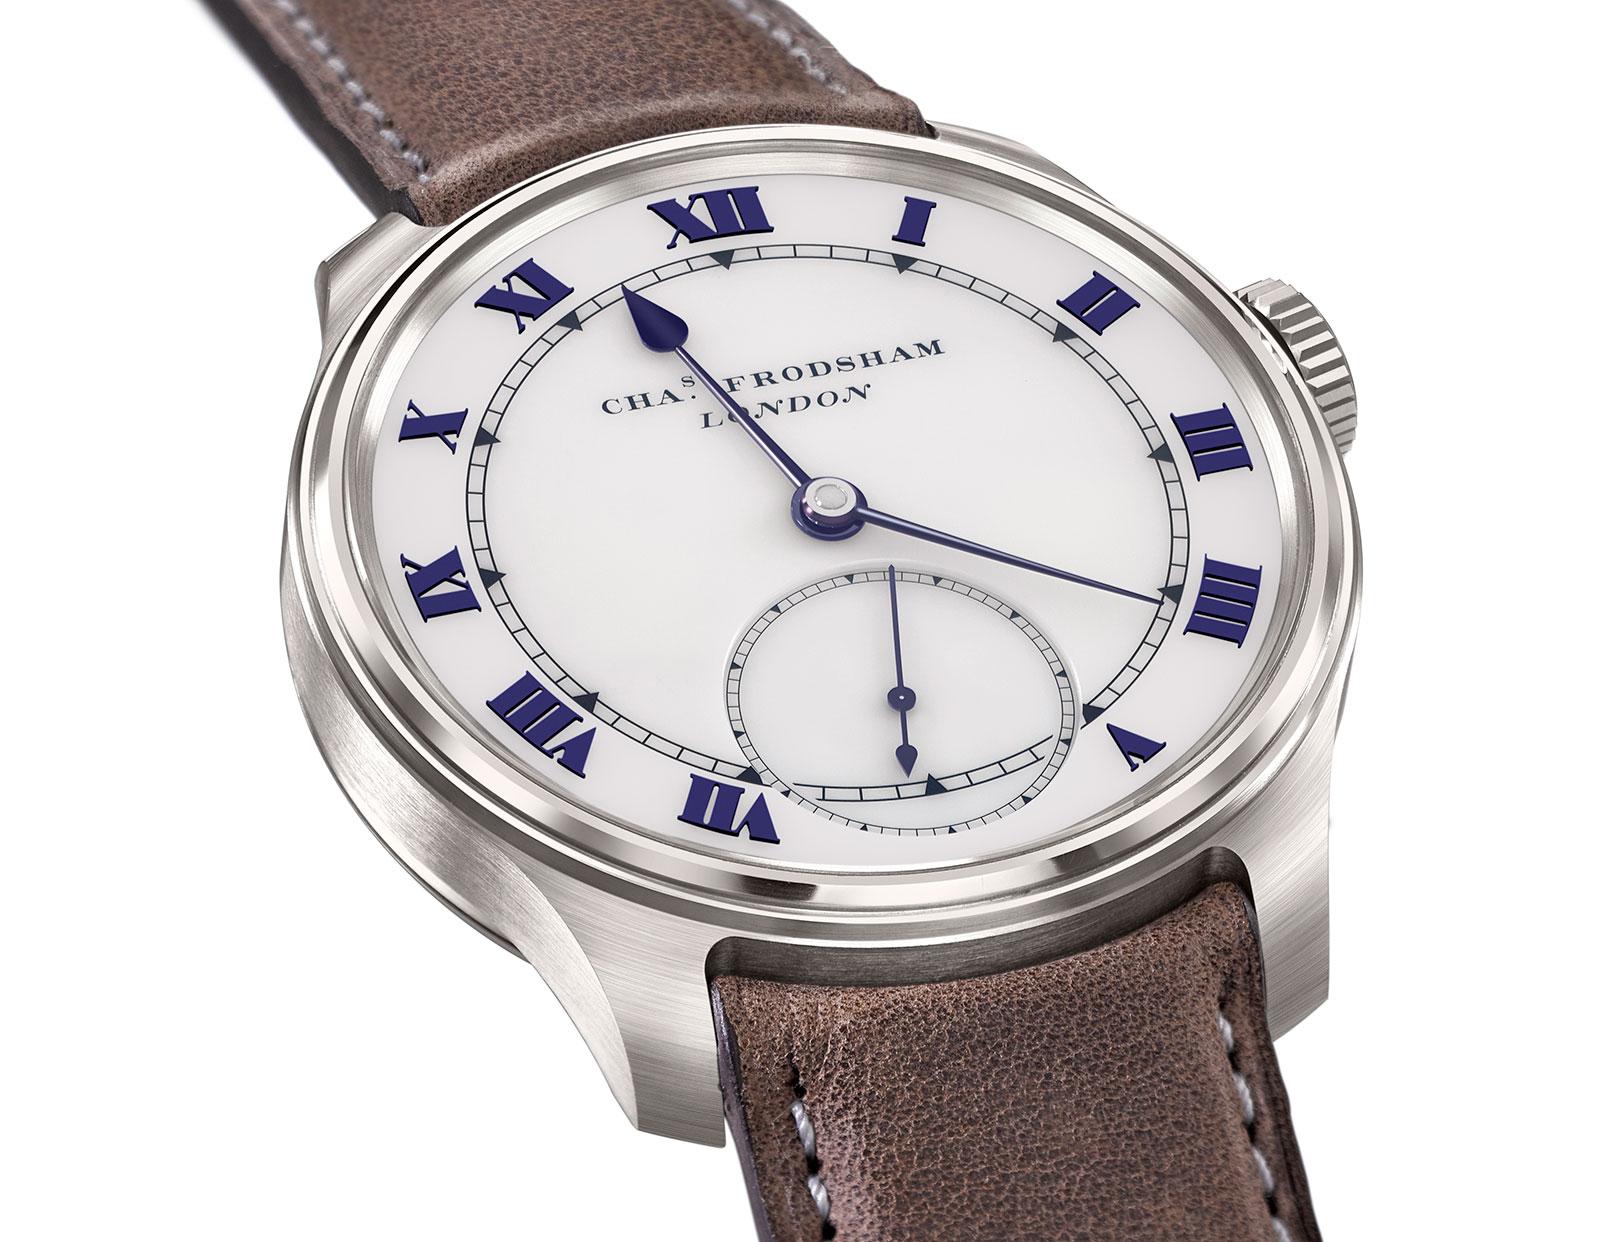 Charles Frodsham Wristwatch Double Impulse Chronometer romans